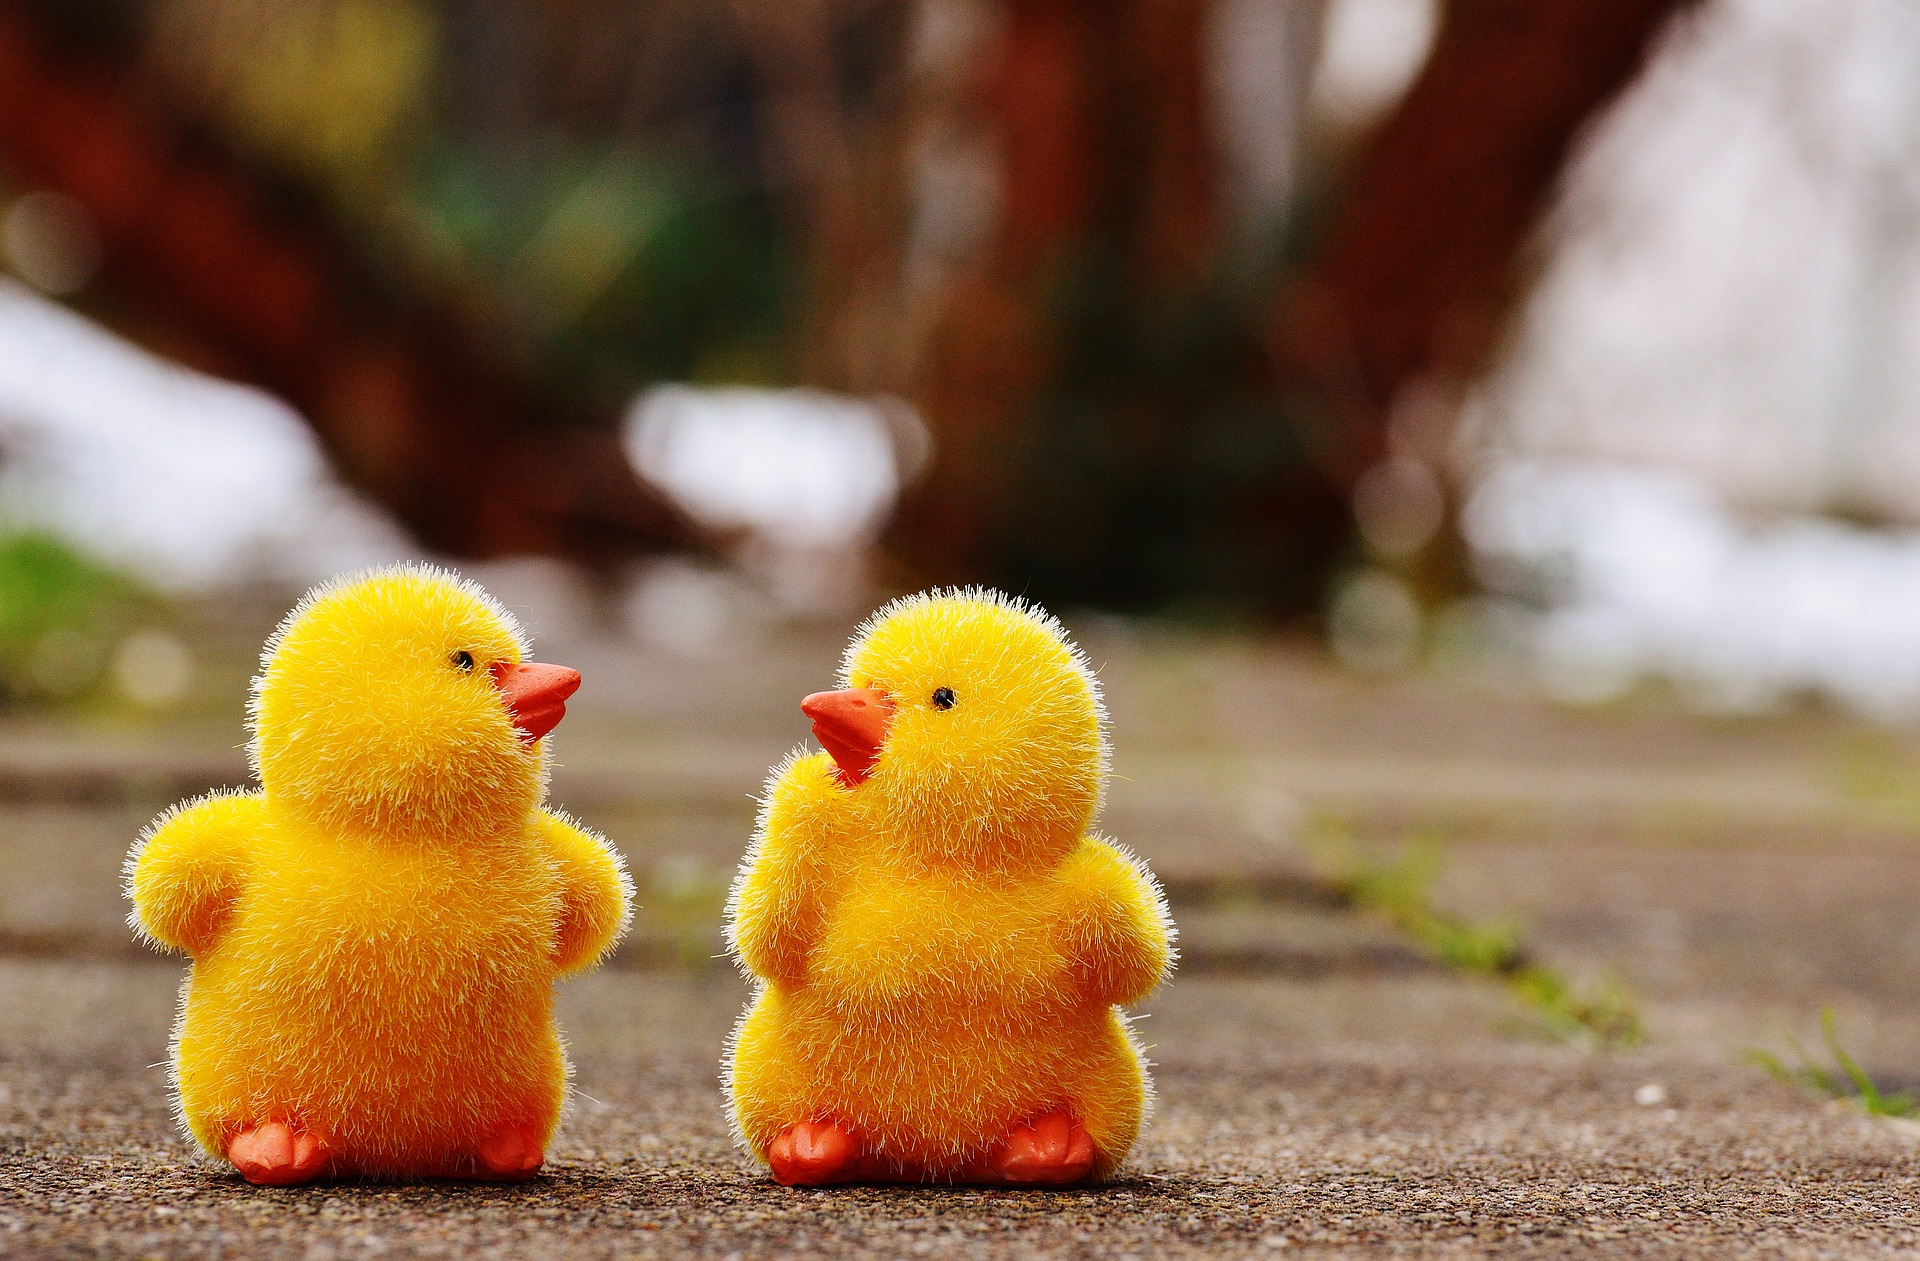 chicks-1159194_1920